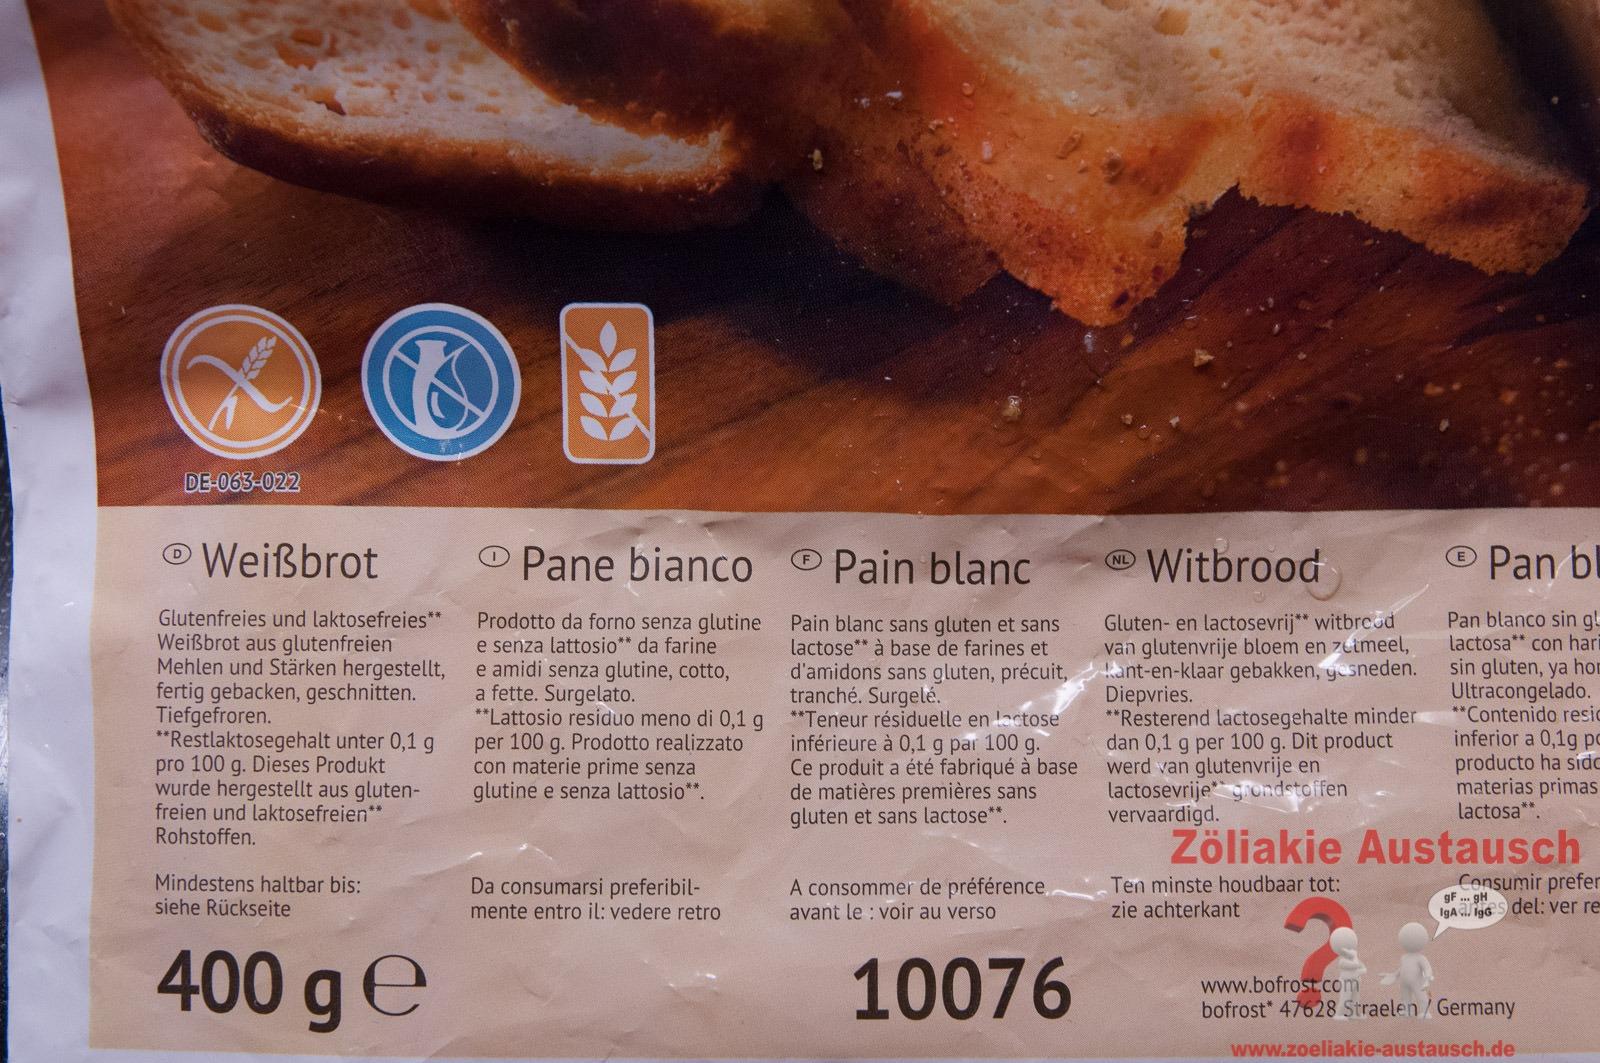 Zoeliakie_Austausch_BoFrost-035